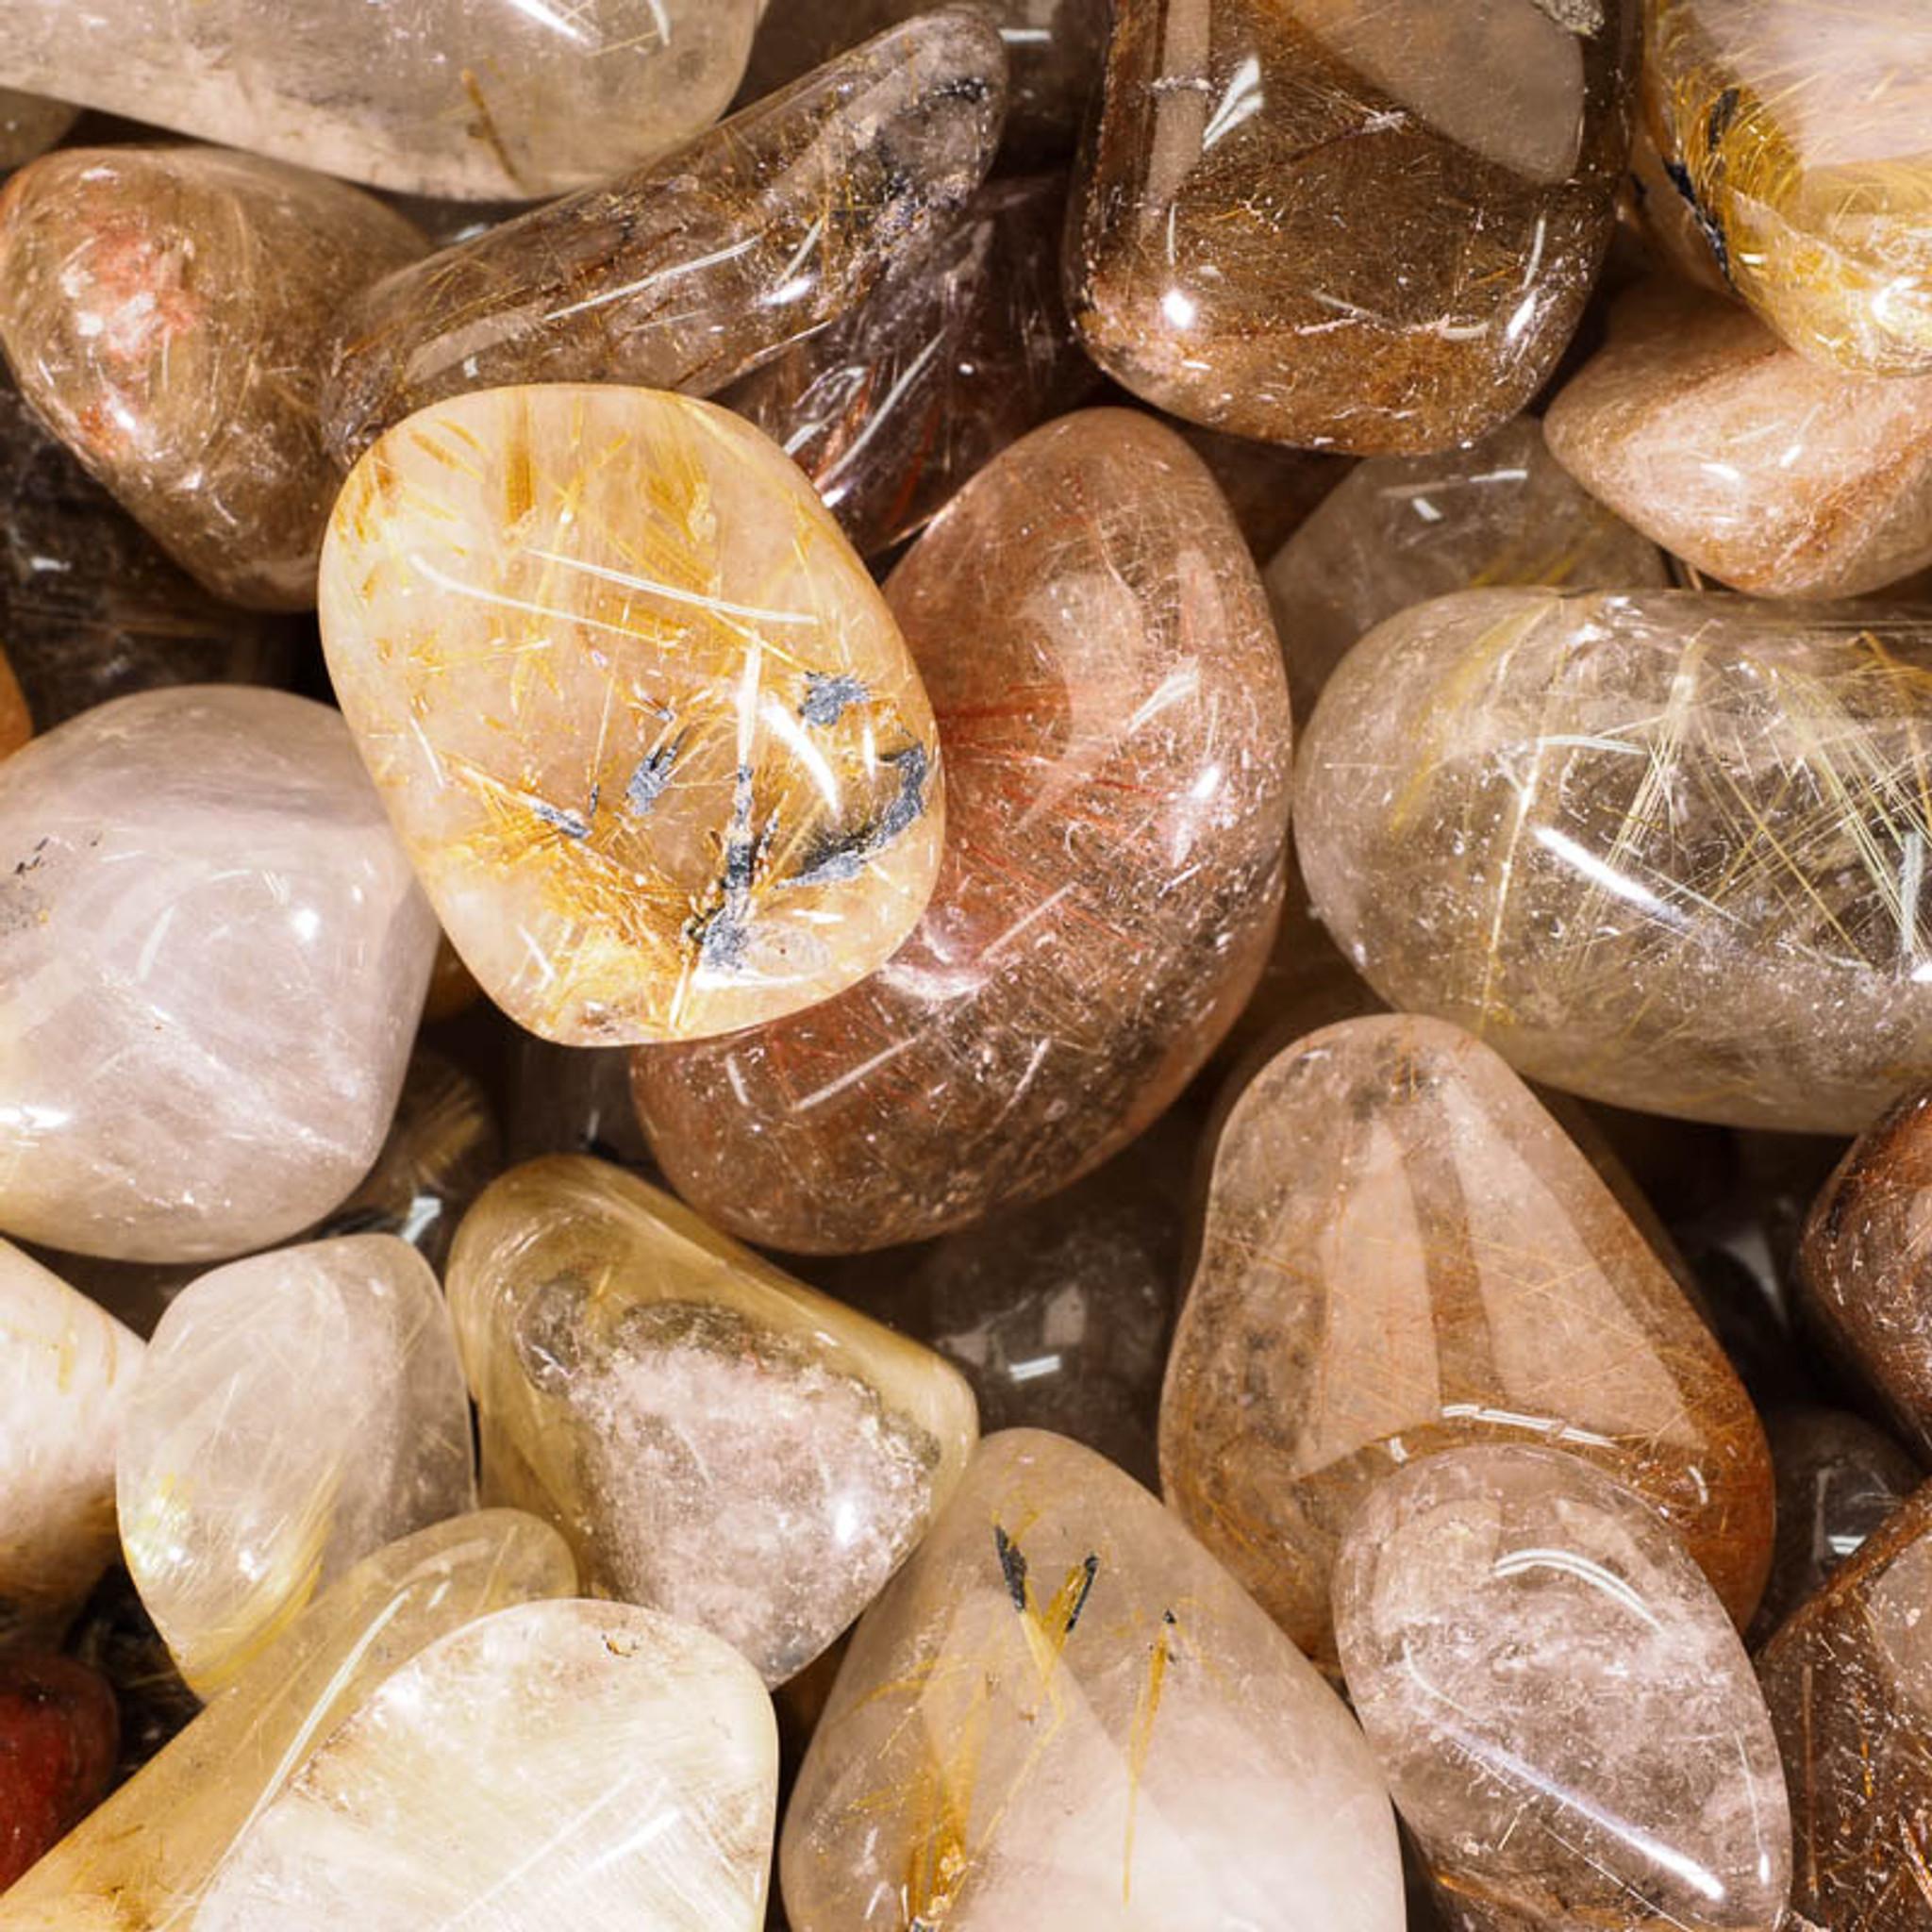 Gold Rutile Quartz Polished Tumbled Gemstone Small